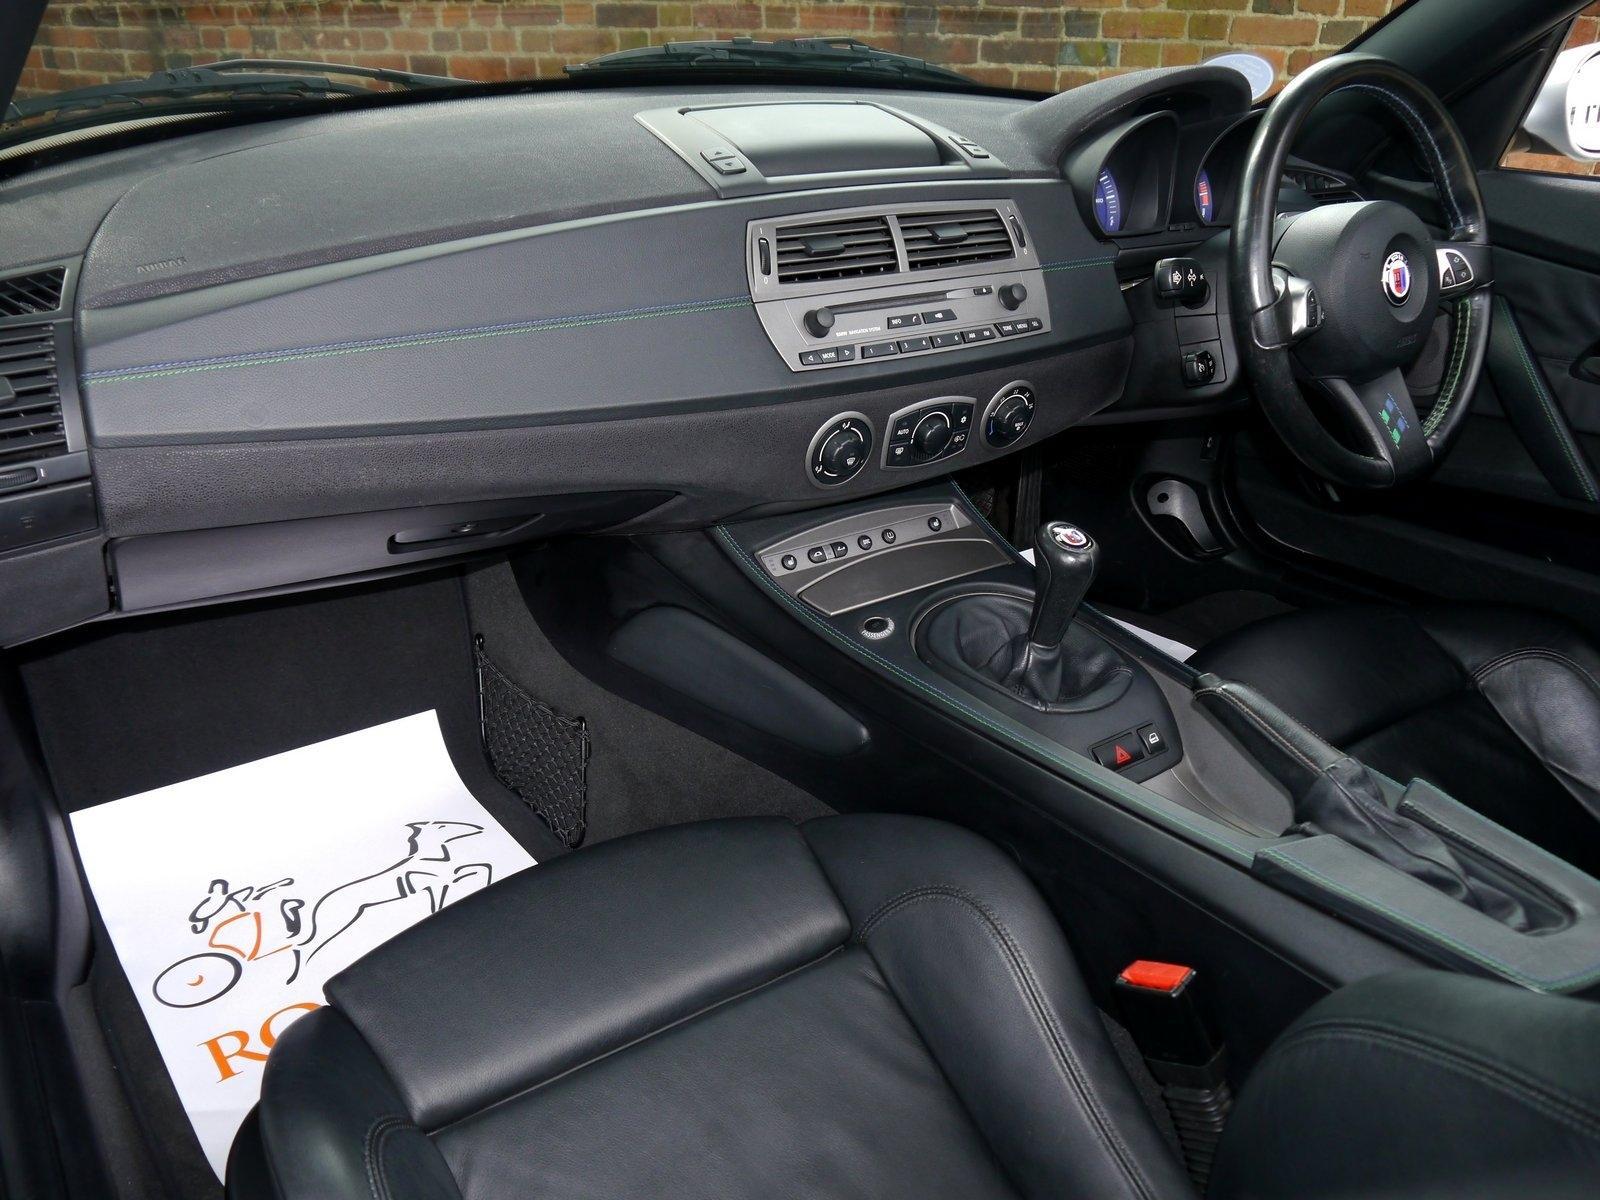 BMWALPINA ROADSTER 3.4 S LUX - RARE VEHICLE - BMW FSH #8